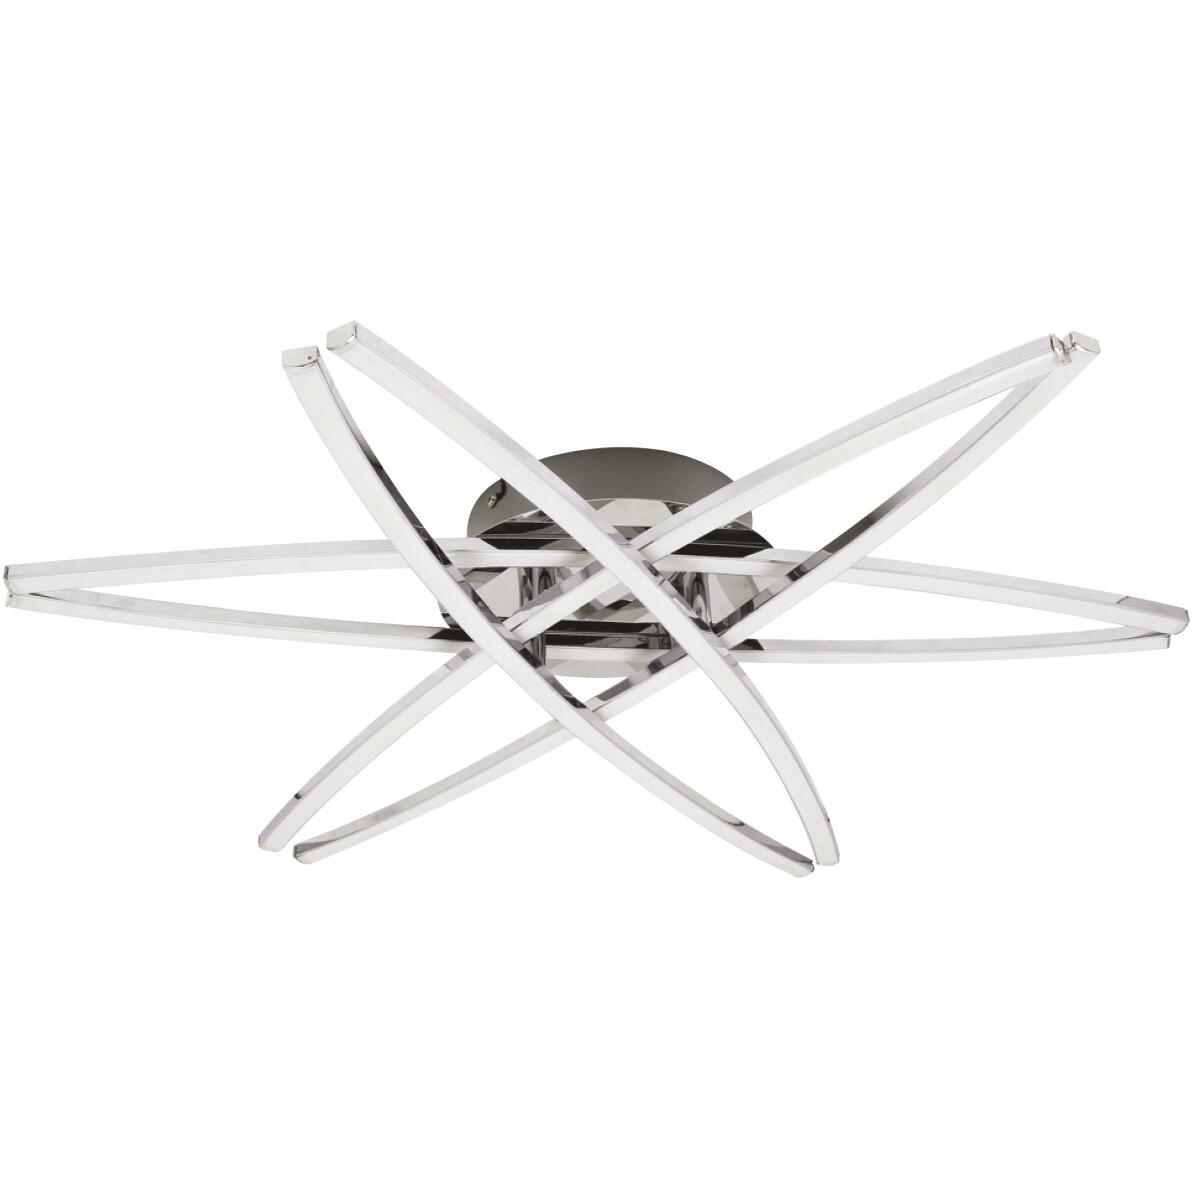 LED Plafondlamp - Plafondverlichting - Akalon - 35W - Natuurlijk Wit 4000K - Mat Chroom - Aluminium